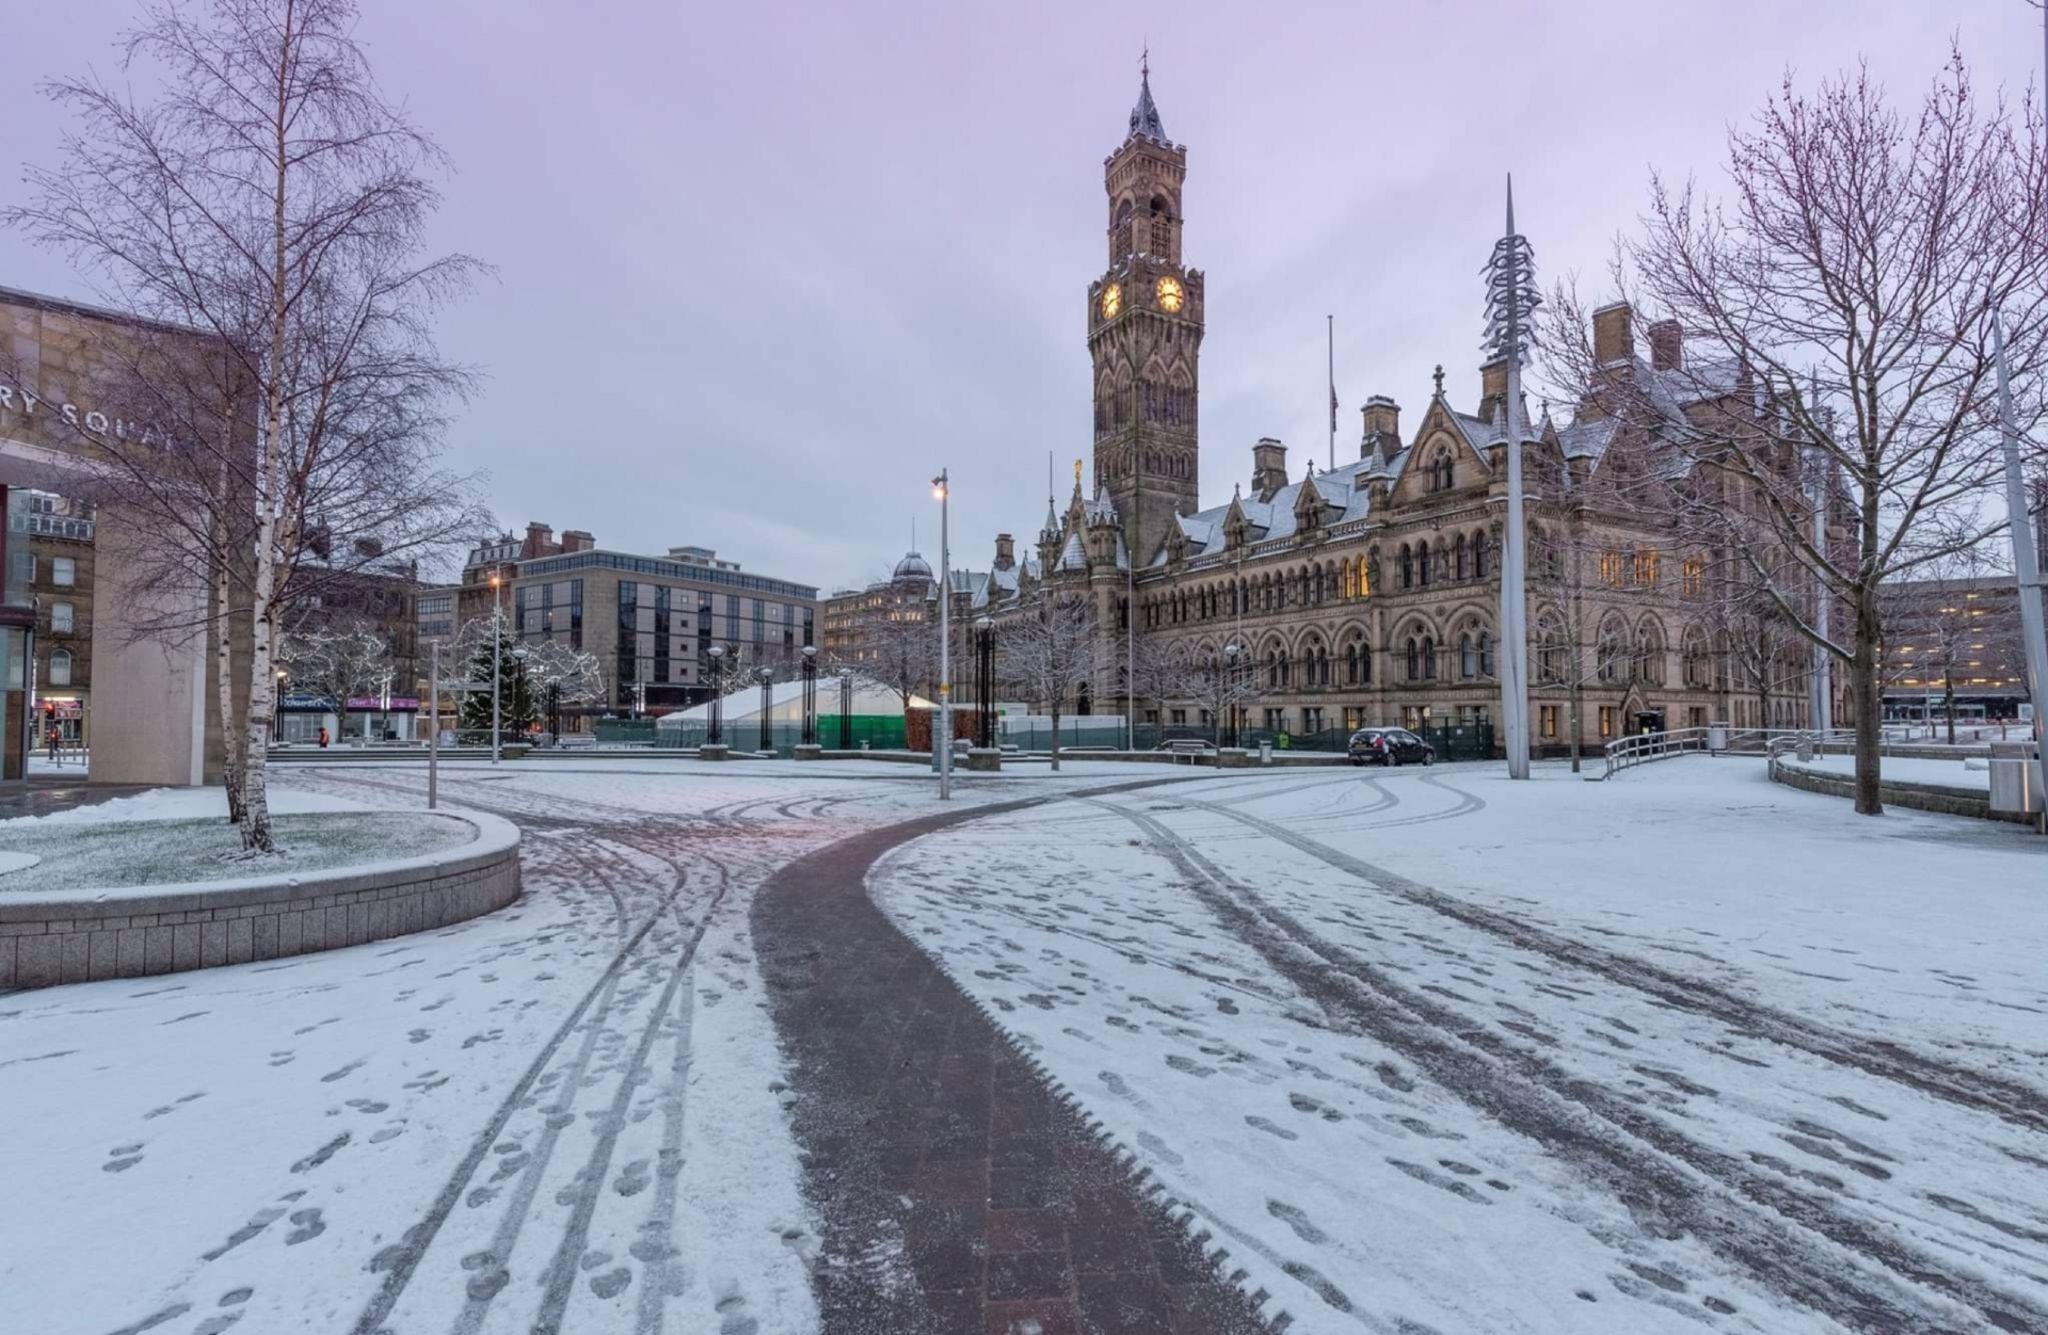 Bradford City Hall